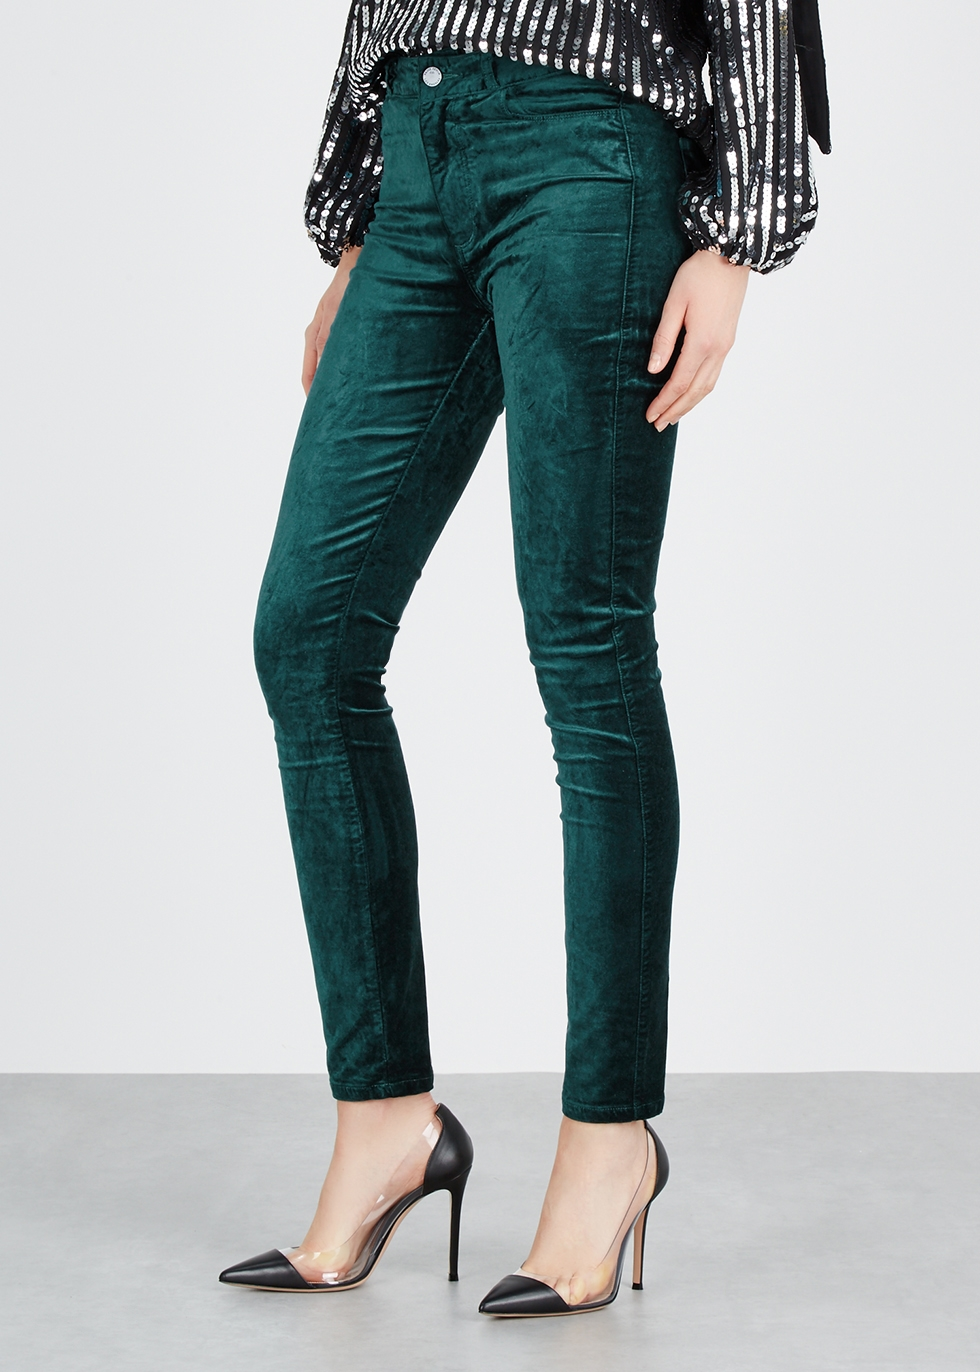 Hoxton teal skinny velvet jeans - Paige